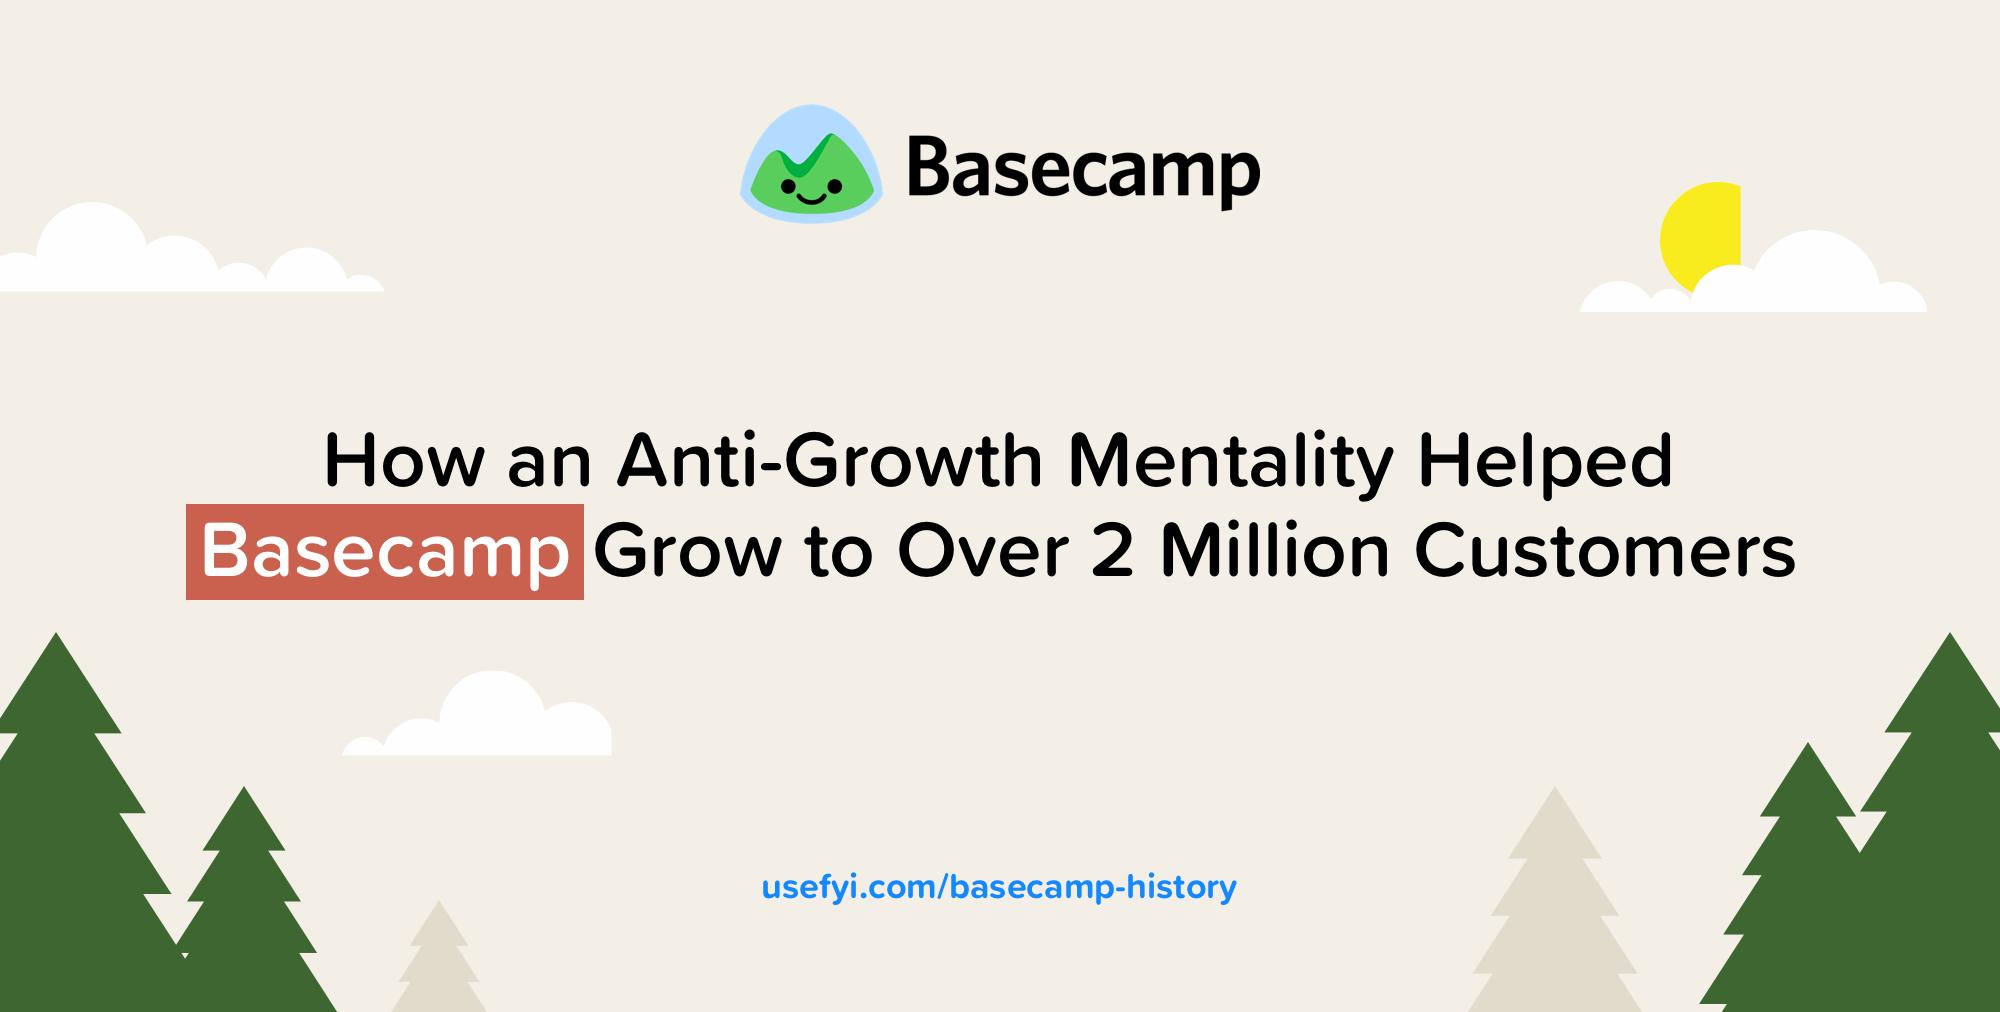 Basecamp History